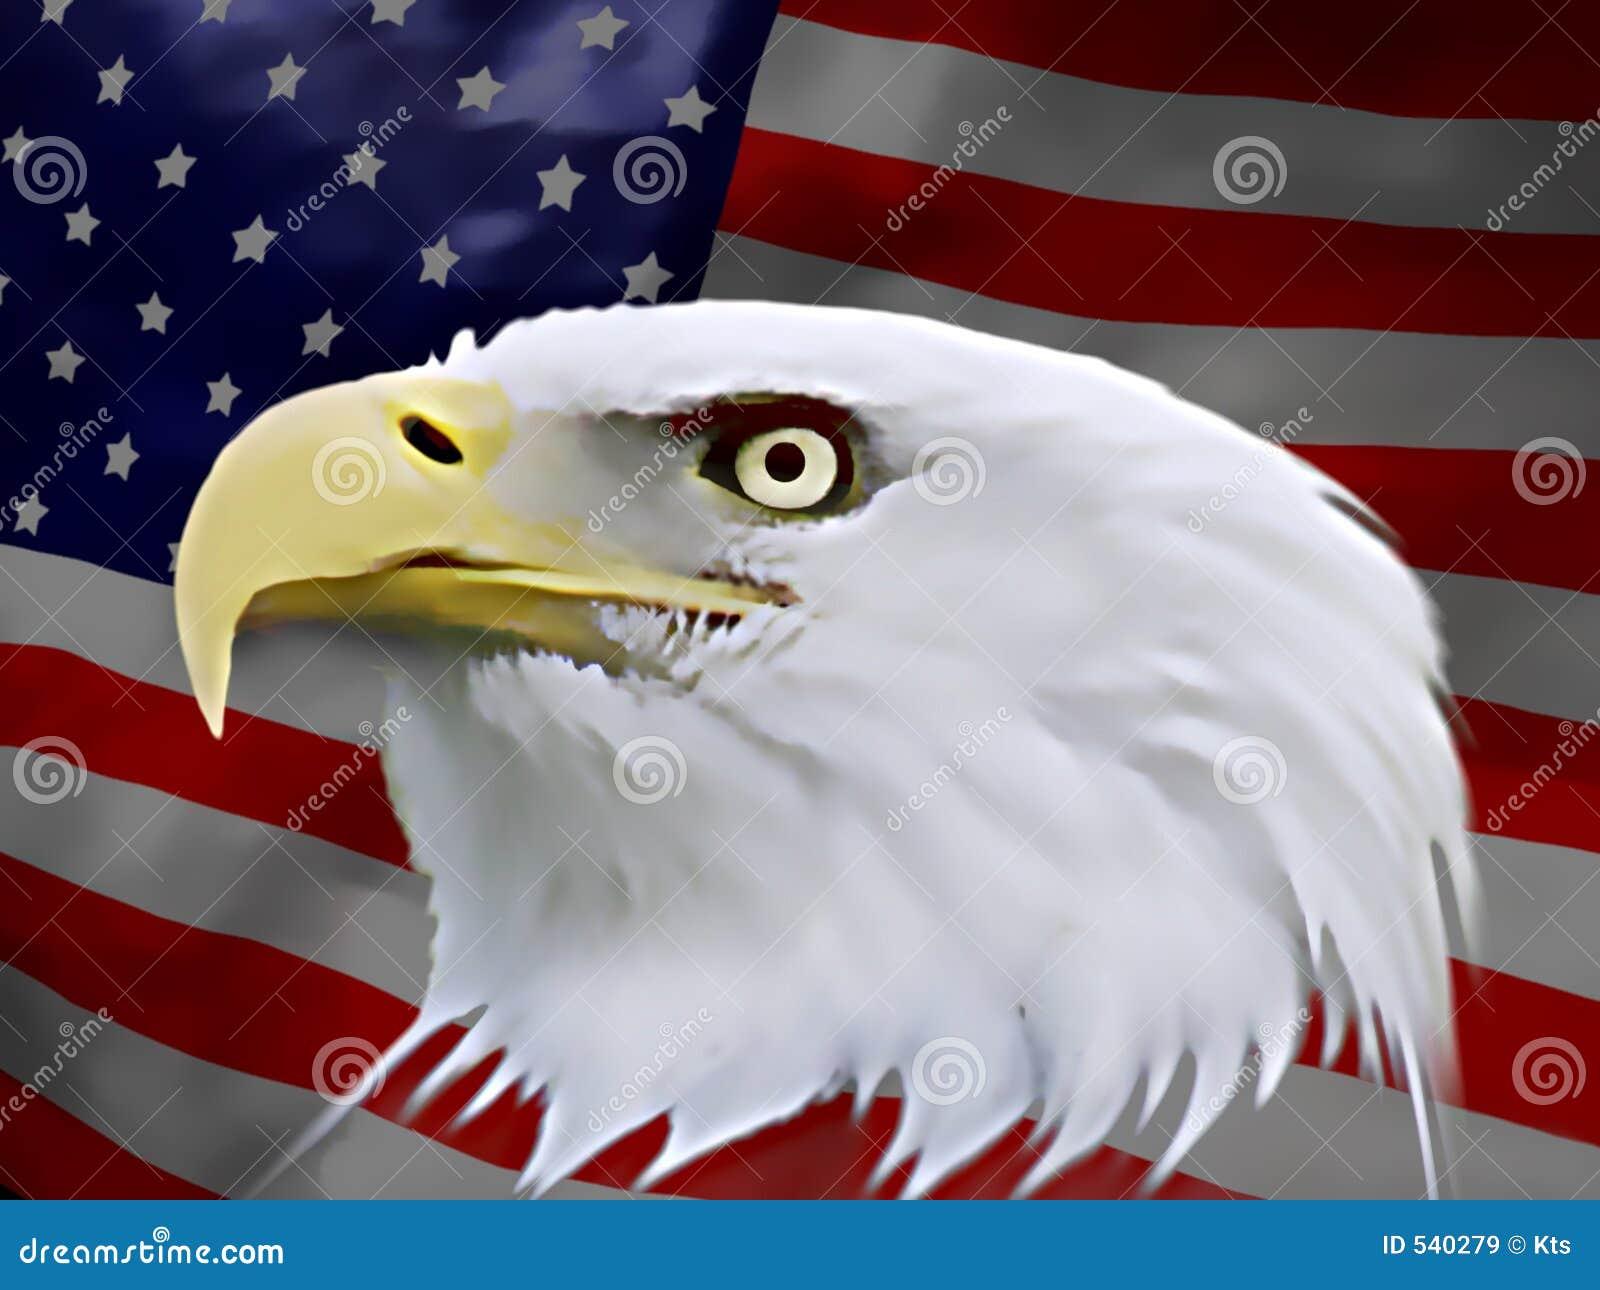 Download 美国老鹰标志 库存例证. 插画 包括有 团结, 本质, 自豪感, 爱国, 纵向, 国家, 次幂, 猛禽, 力量 - 540279